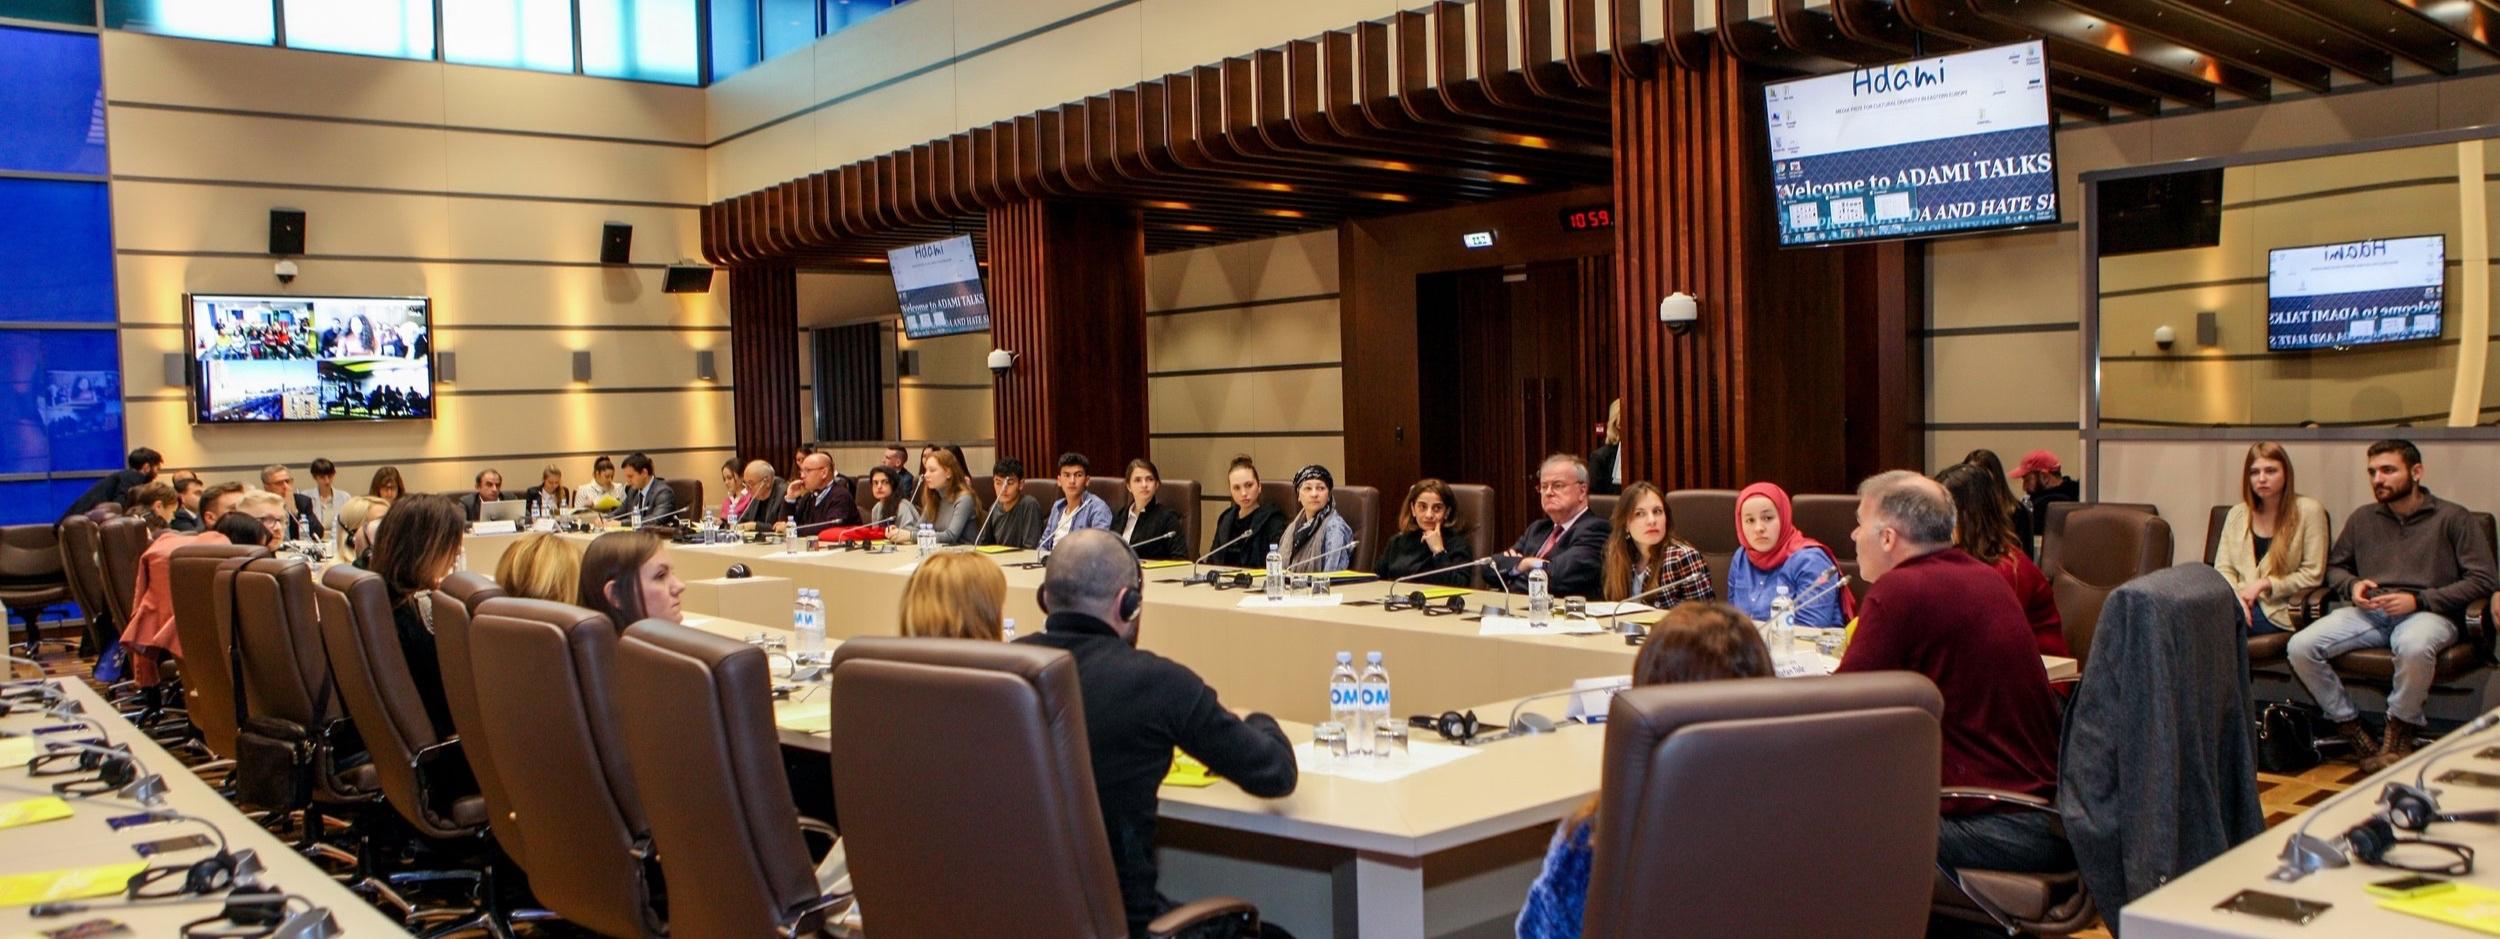 ADAMI TALK 2018 - Chisinau, Moldova